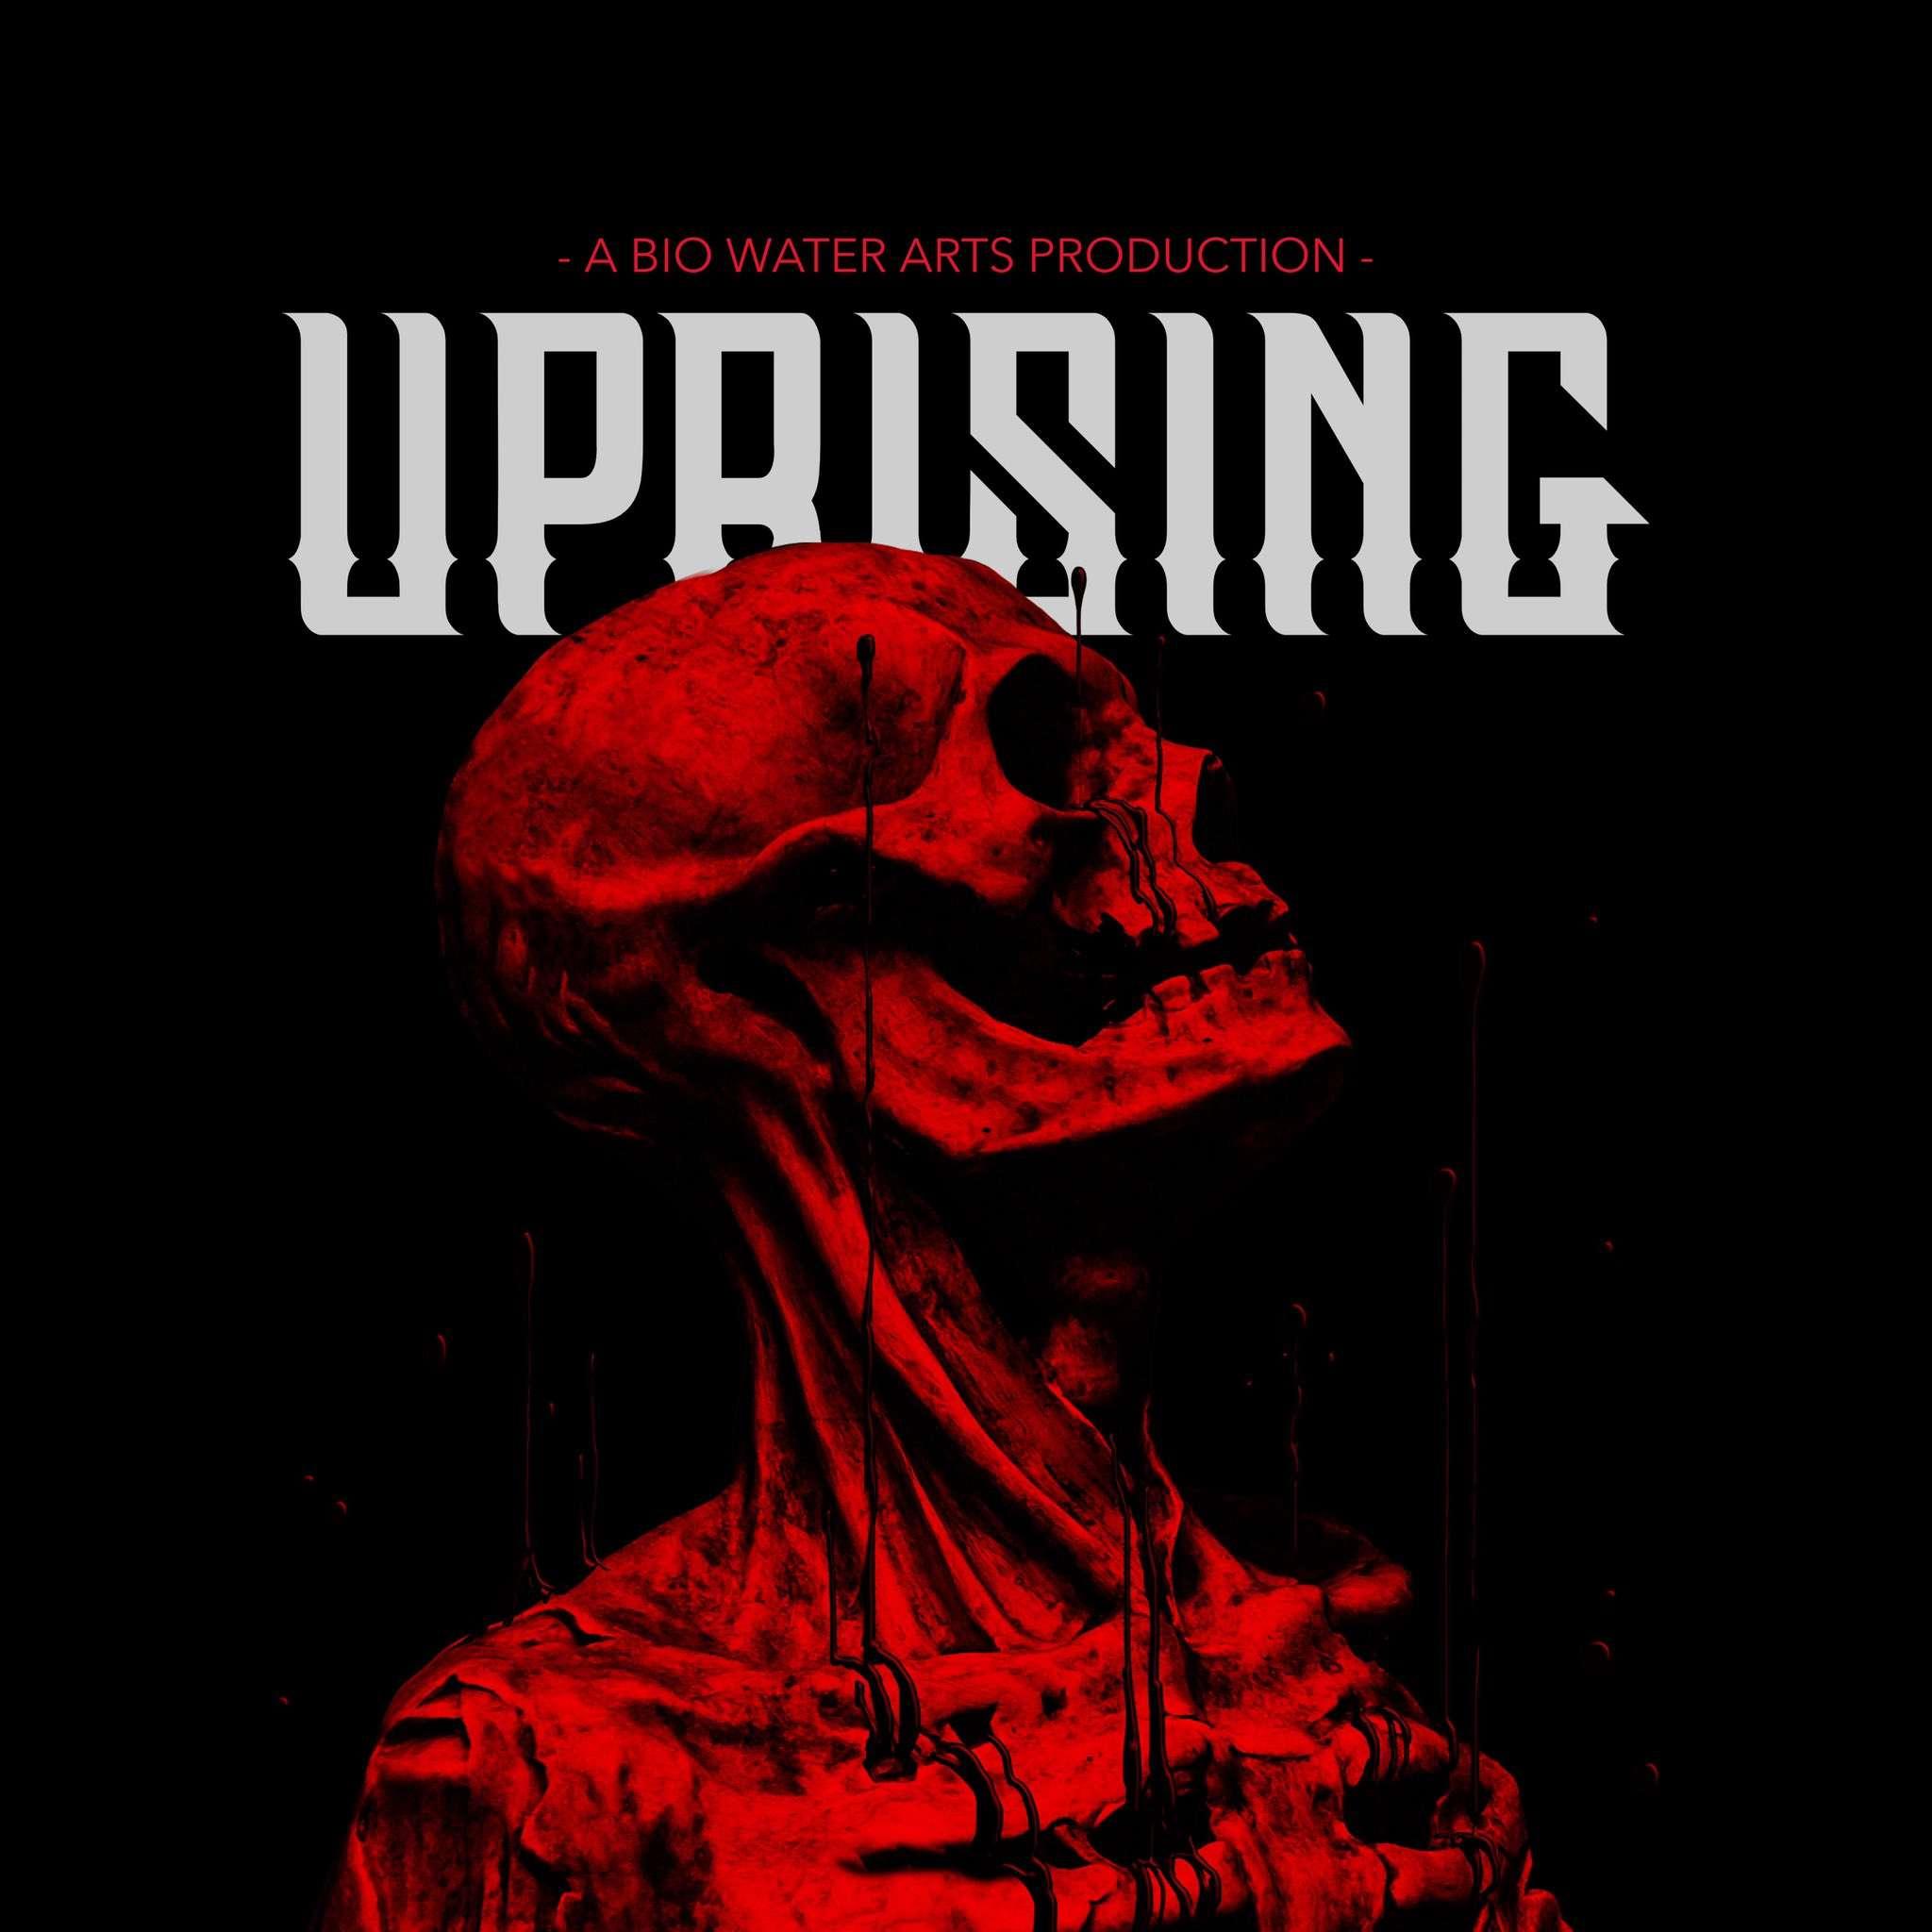 f79d3409dafc8d539d284485090503c1 - عرض تشويقي جديد للعبة Uprising